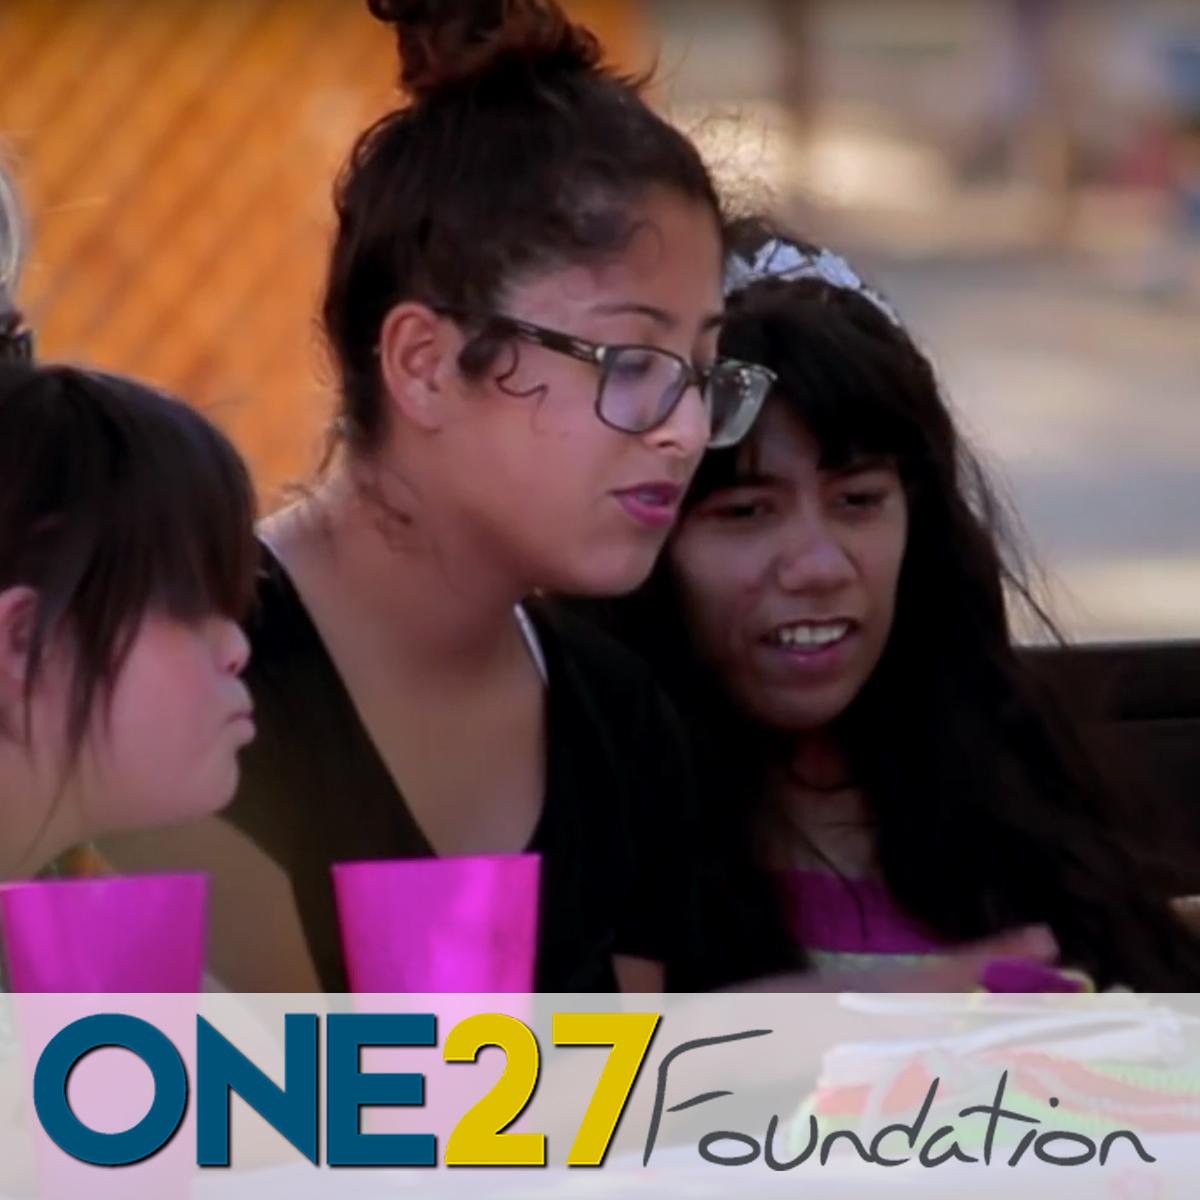 One 27 Foundation